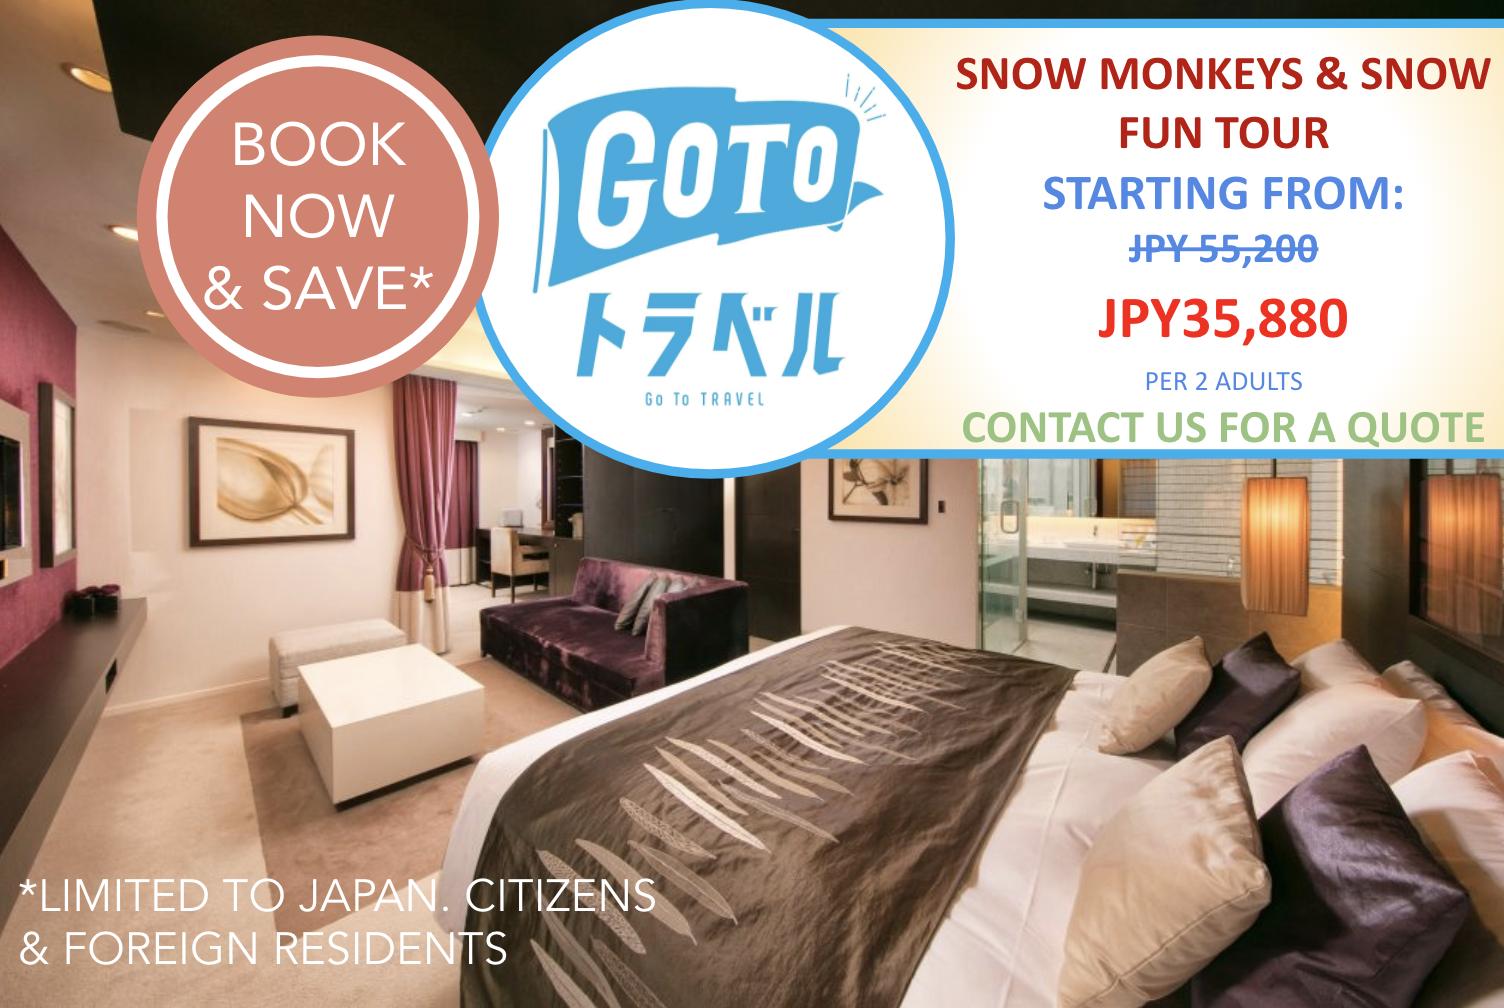 Go To Deals: Snow Monkeys & Snow Fun in Shiga Kogen Tour + Accommodation